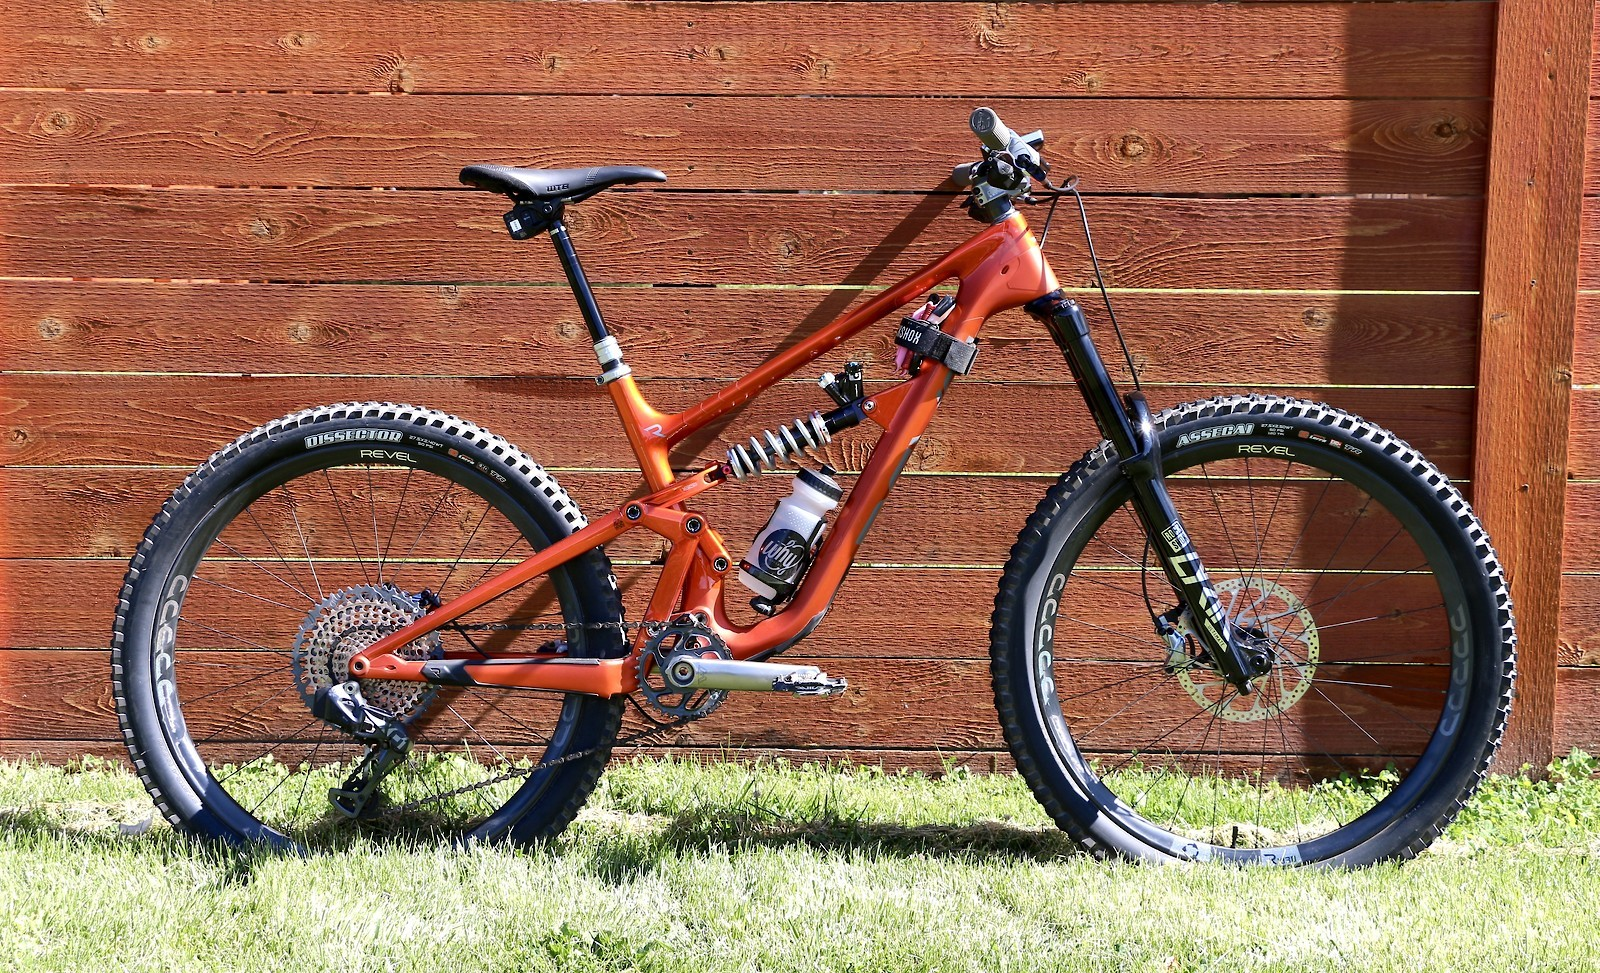 Revel Rail - Vital Bike of the Day June 2020 - Mountain Biking Pictures - Vital MTB